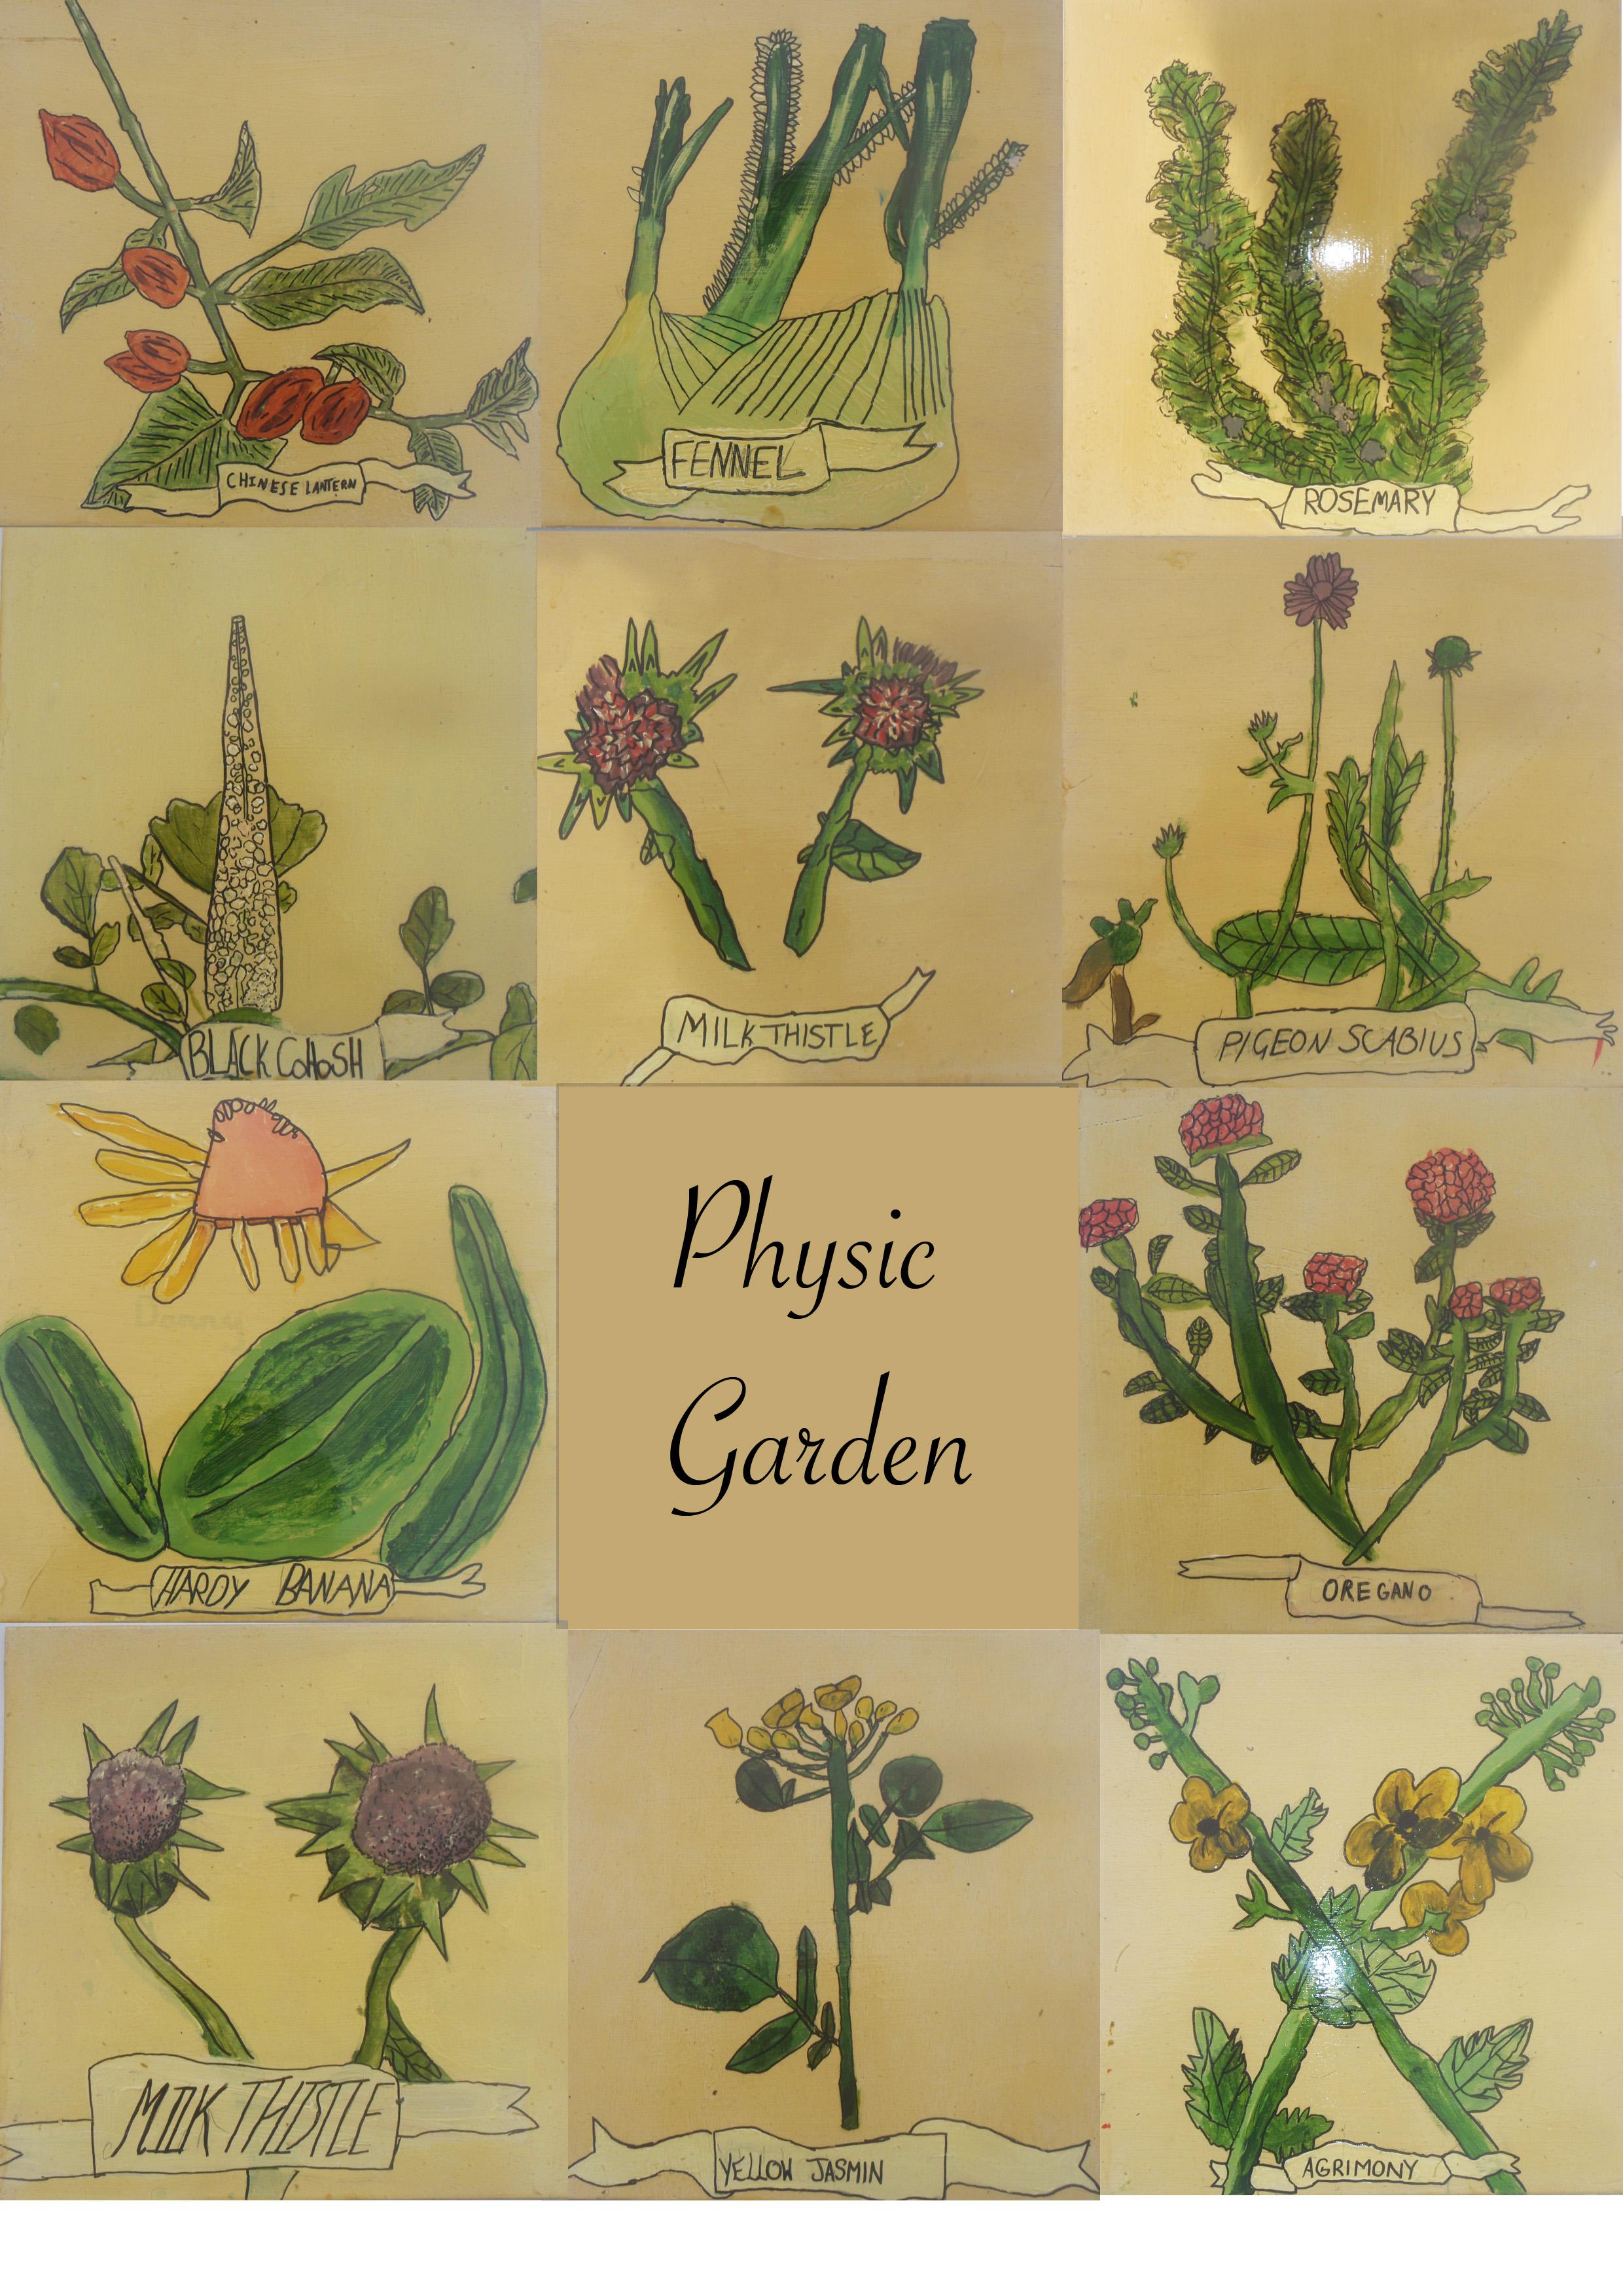 Physic Garden